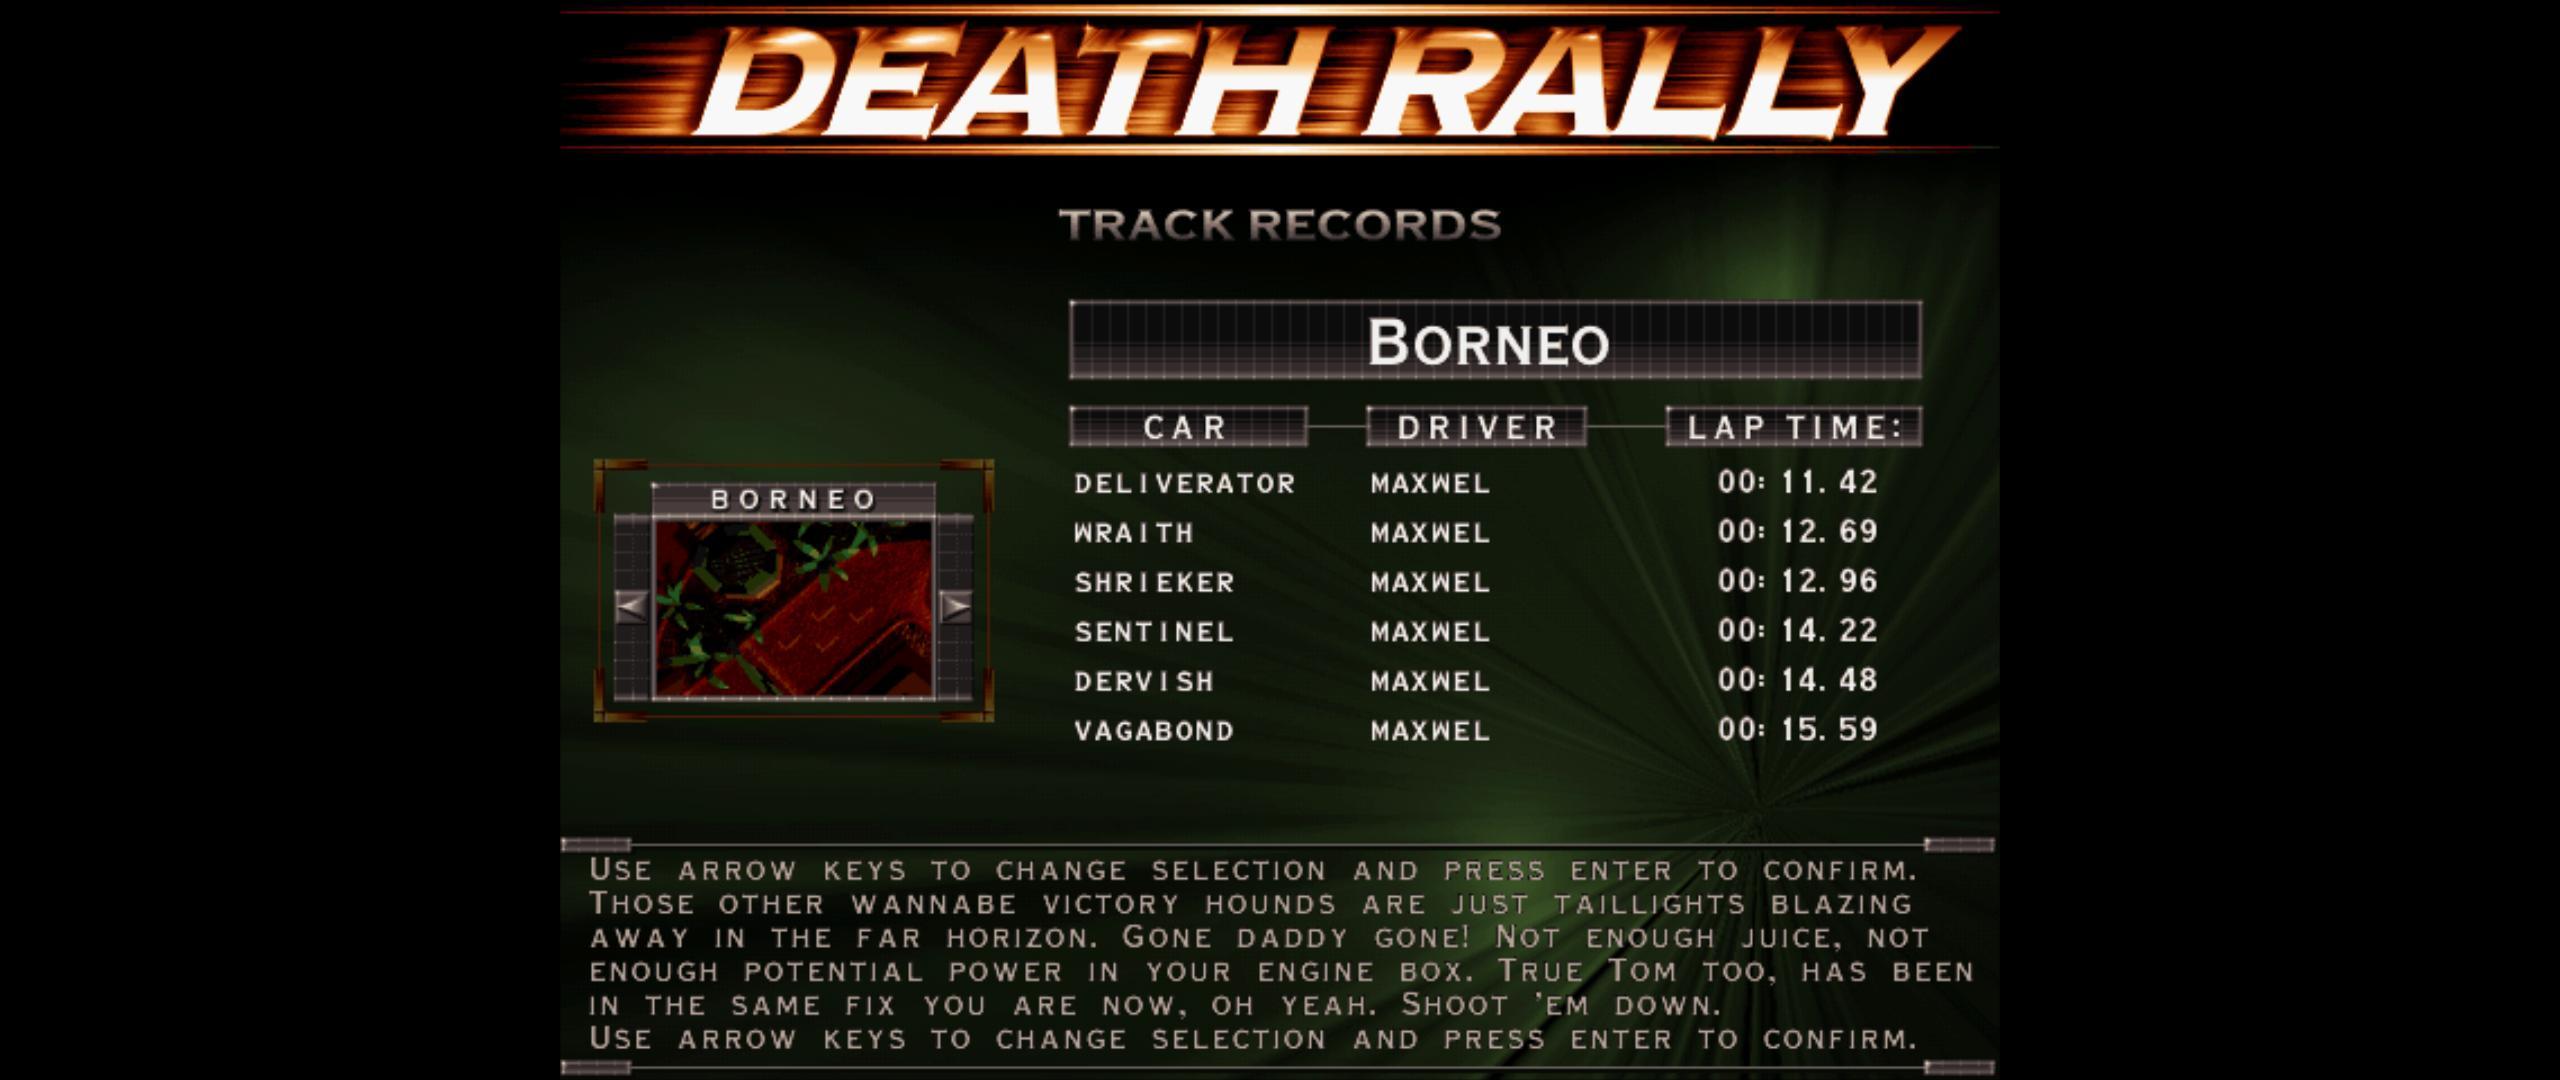 Maxwel: Death Rally [Borneo, Vagabond Car] (PC) 0:00:15.59 points on 2016-03-04 07:53:31